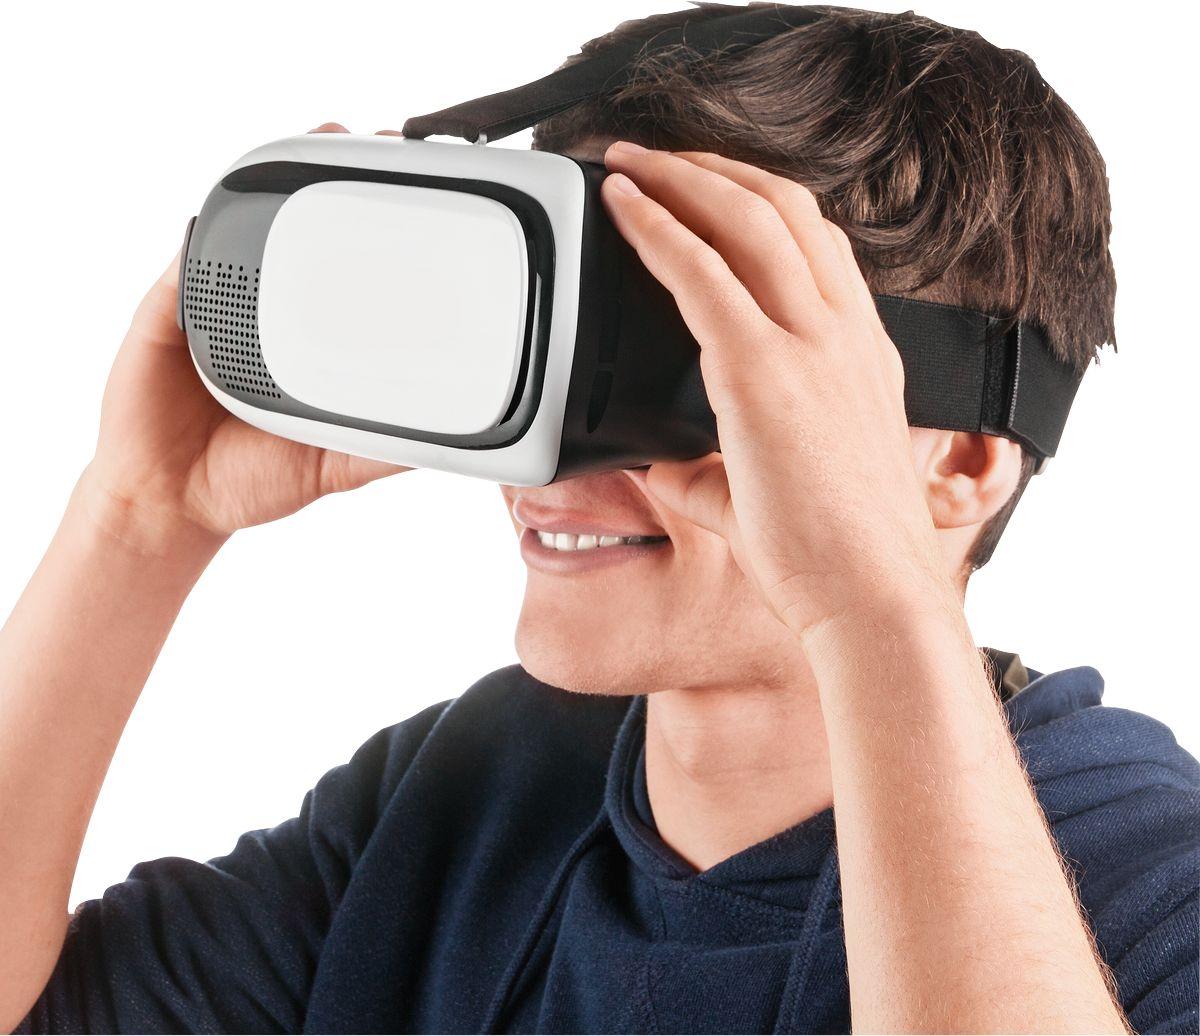 virtual reality brille interfaceplus verstellbares linsensystem aus kunststoff g nstig kaufen. Black Bedroom Furniture Sets. Home Design Ideas